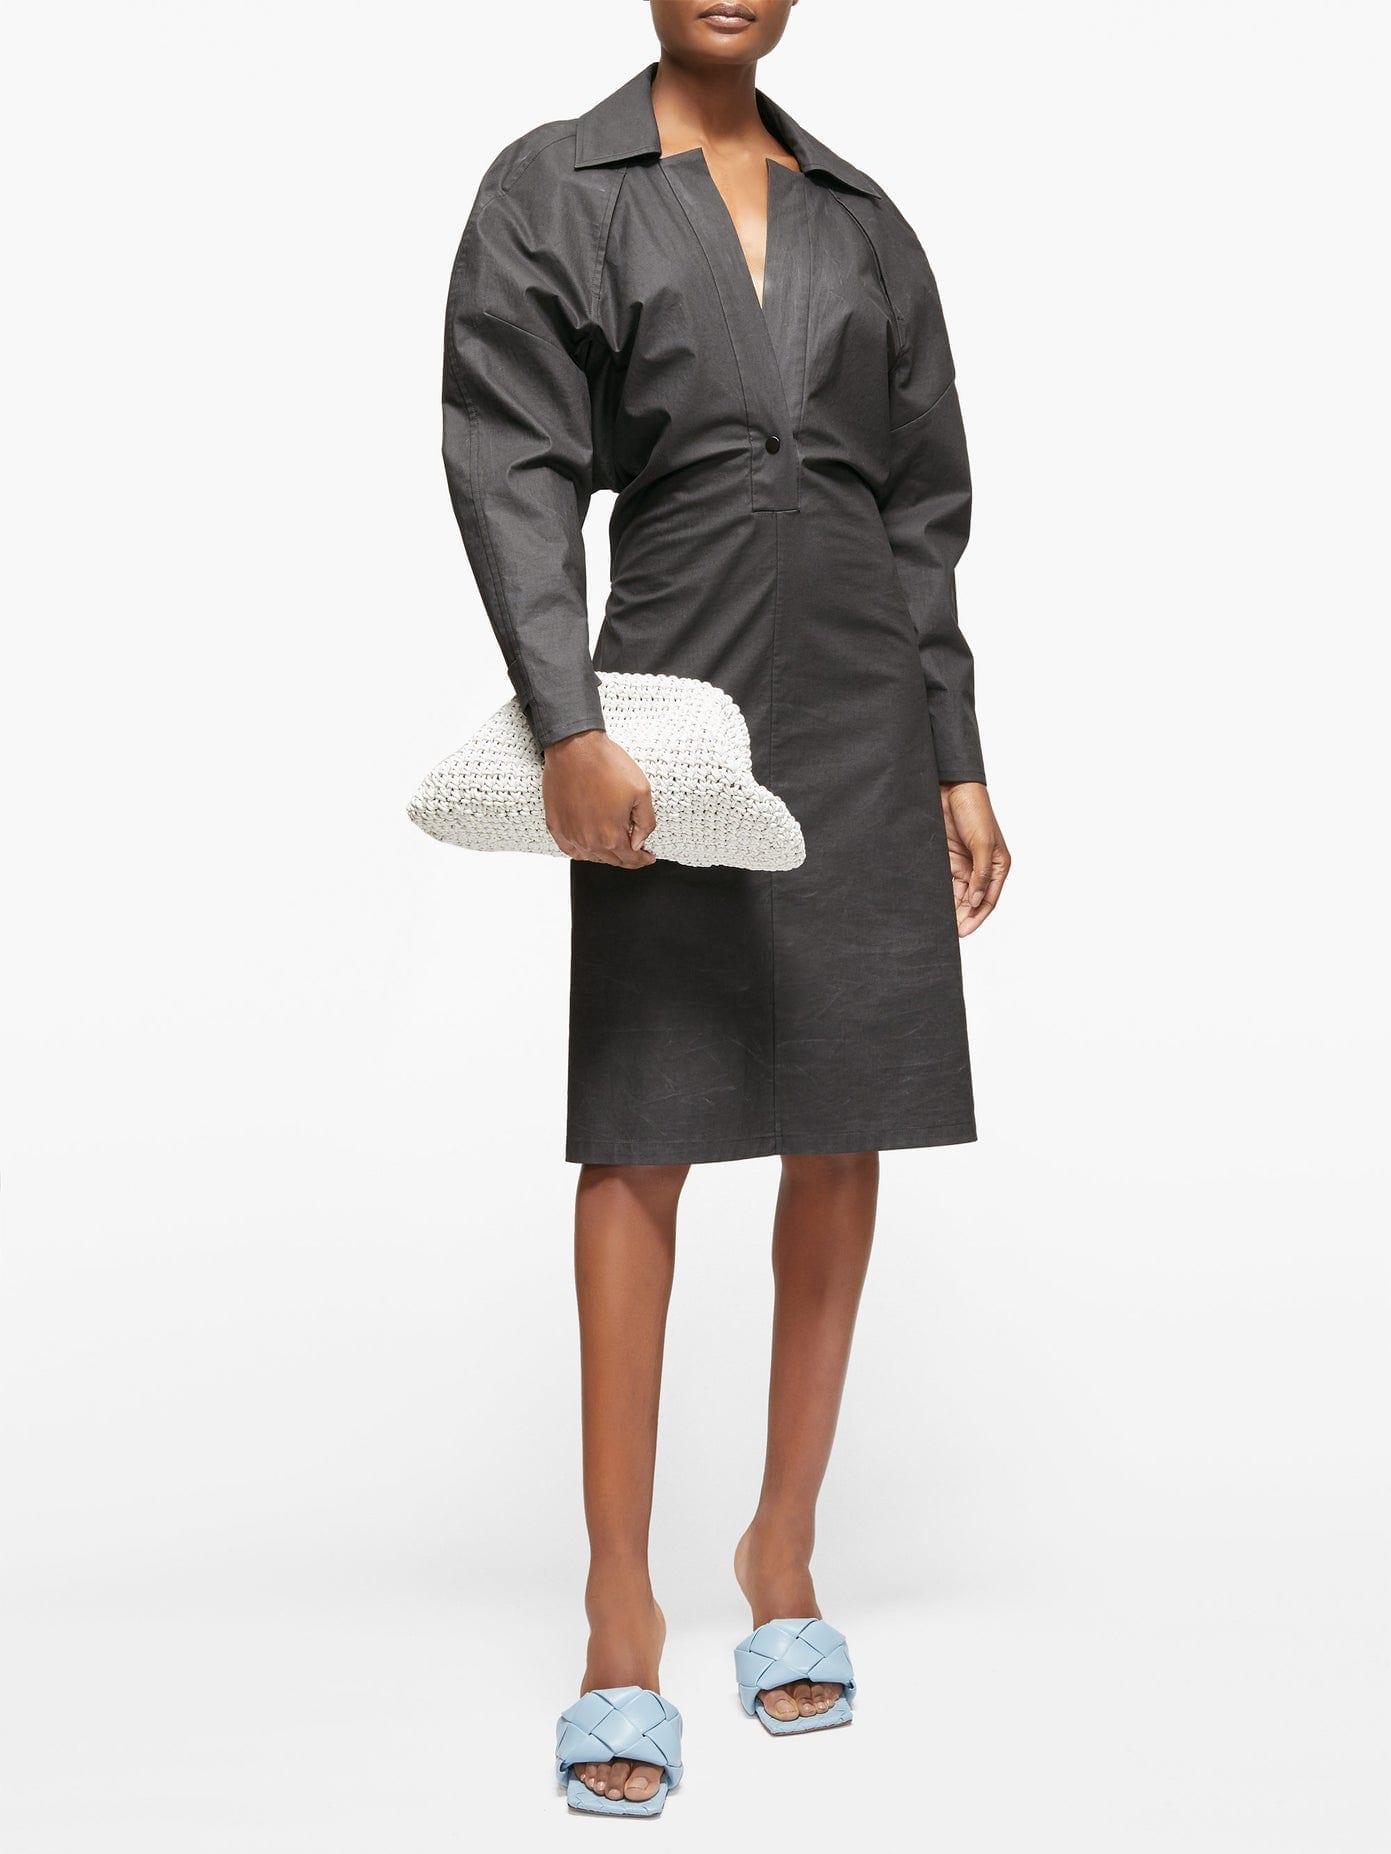 BOTTEGA VENETA Dropped-shoulder Technical-cotton Shirt Dress